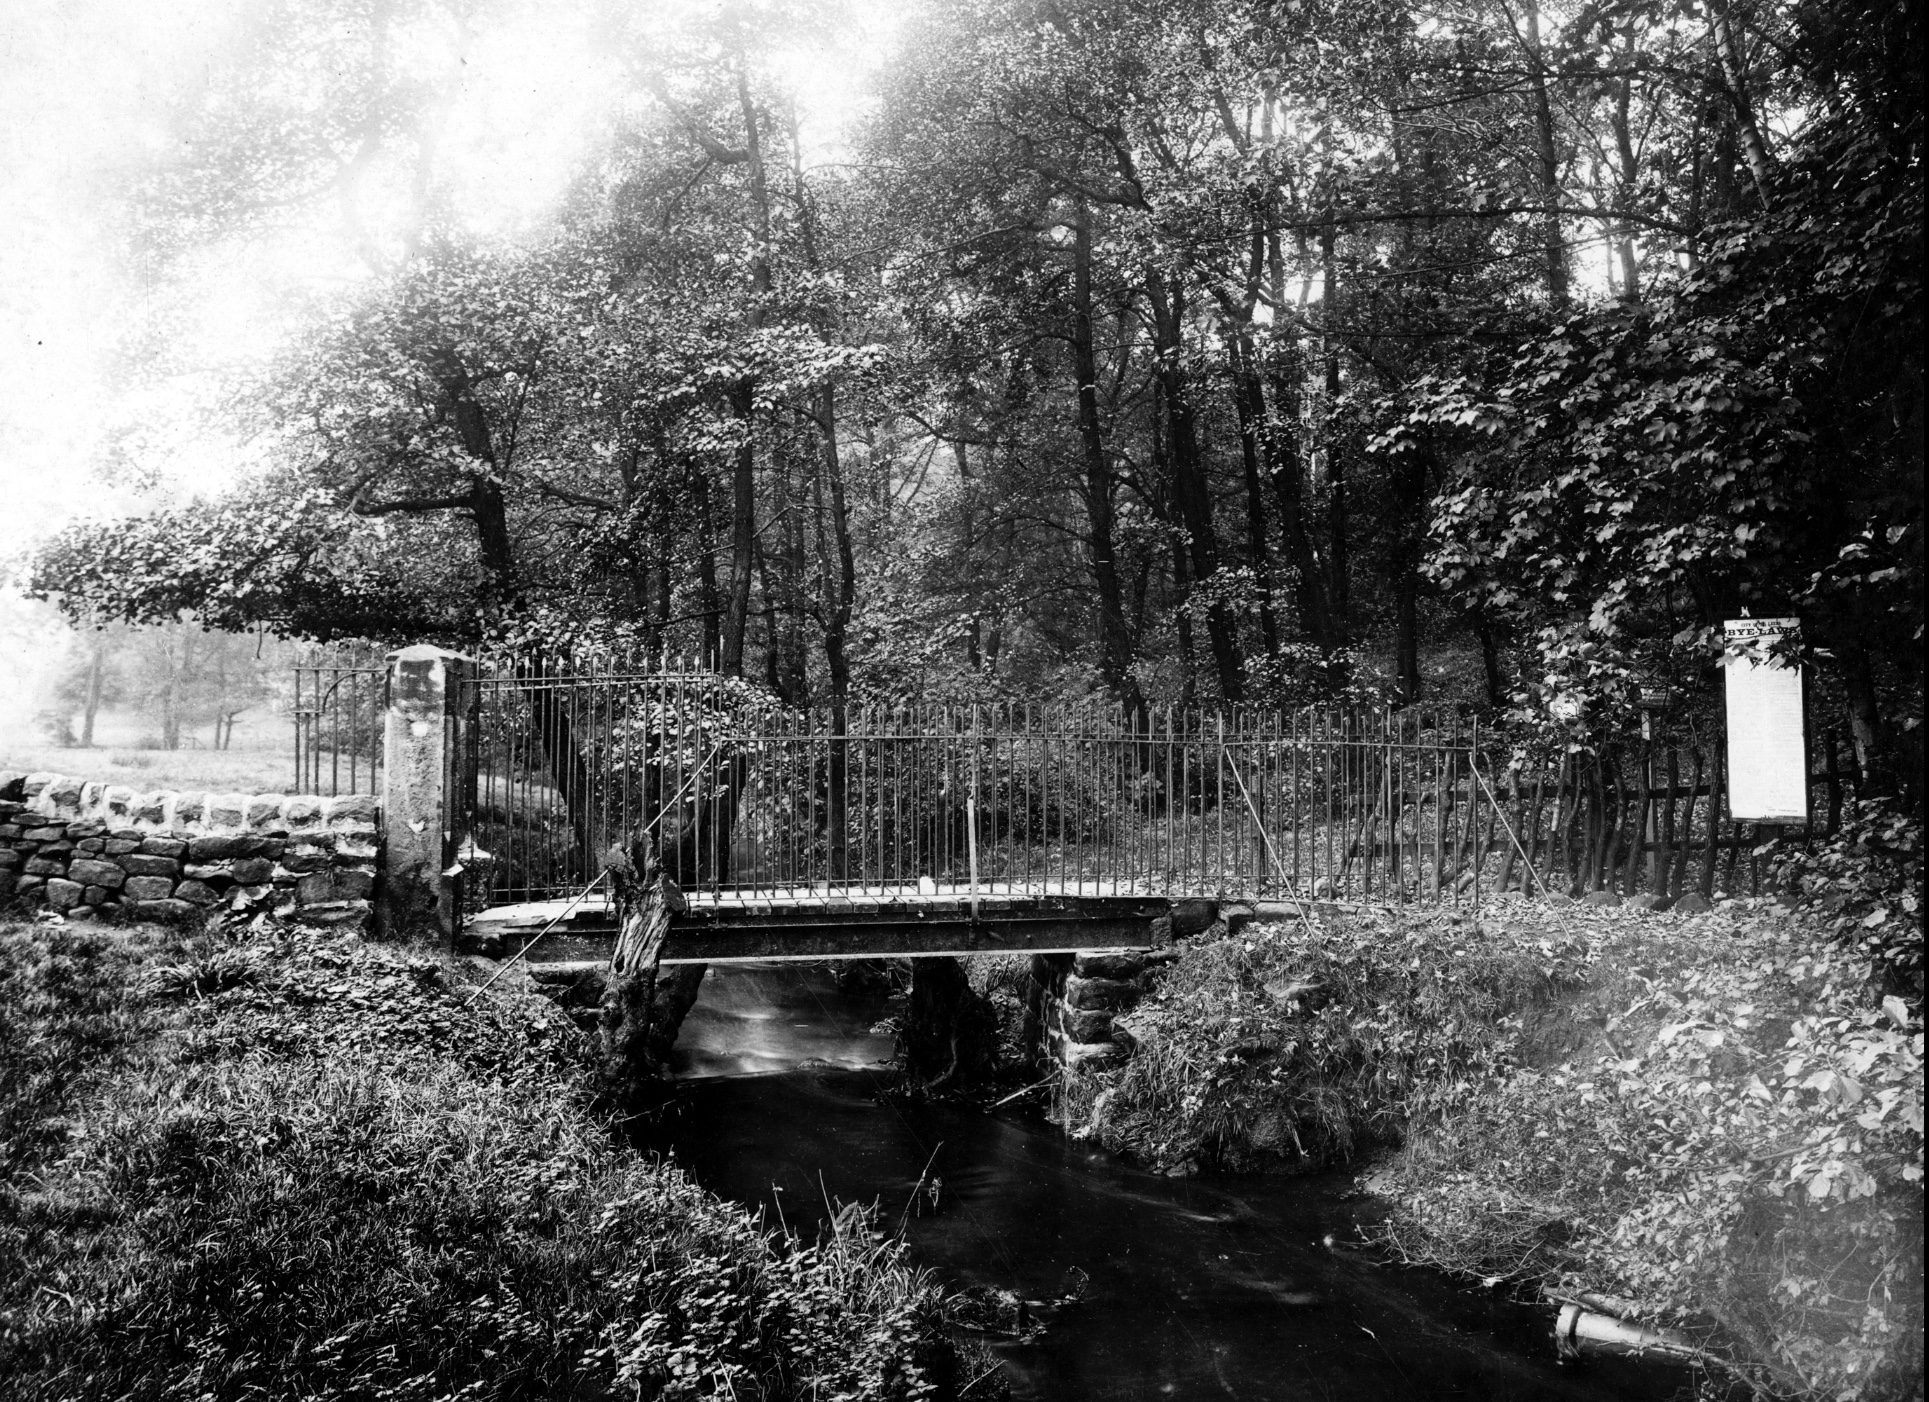 The Hollies, New Bridge with Iron Railings, 1927